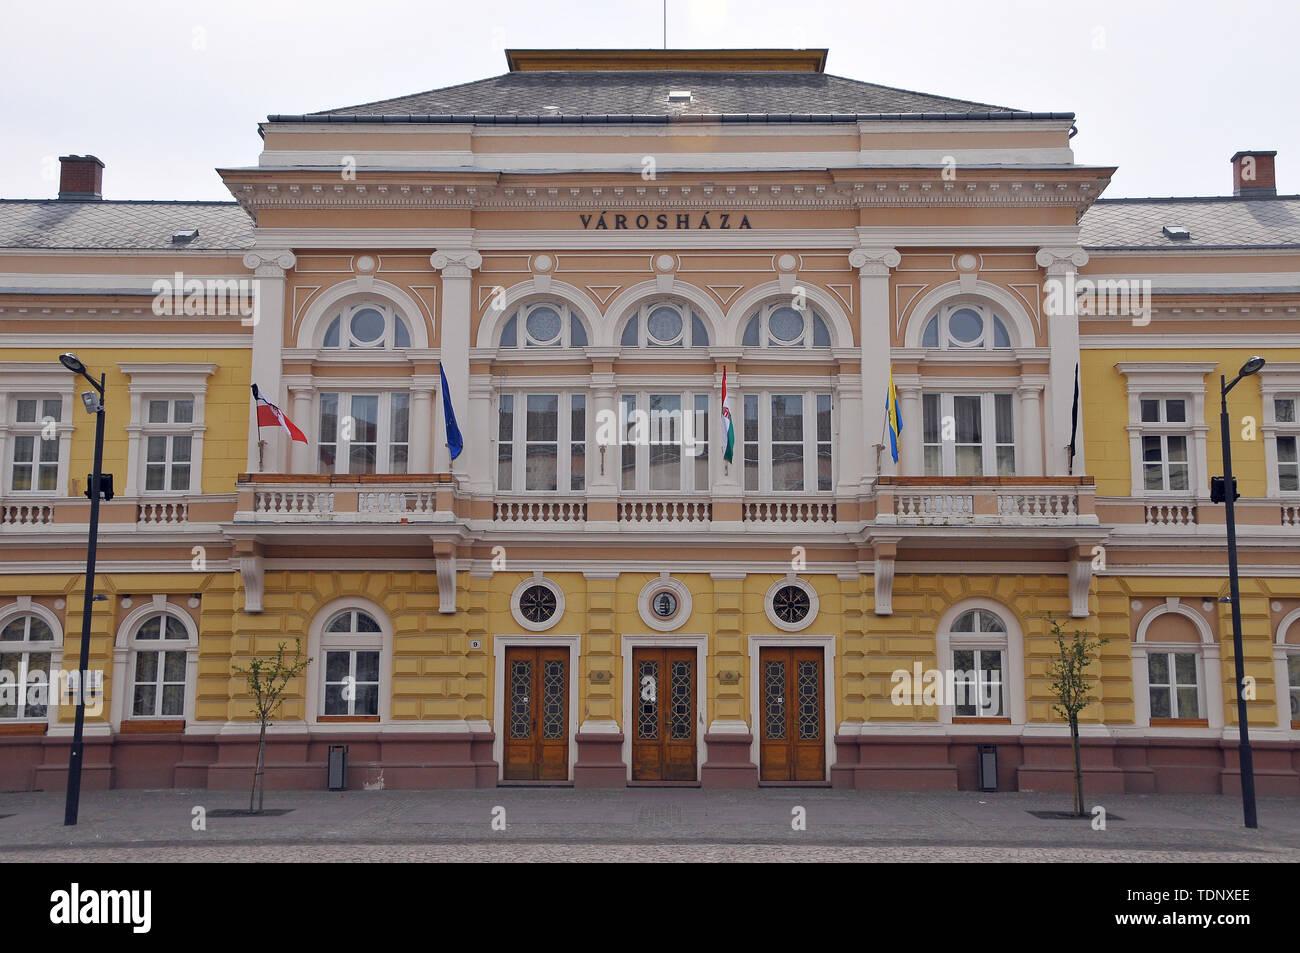 City hall, Szolnok, Hungary, Magyarország, Europe - Stock Image